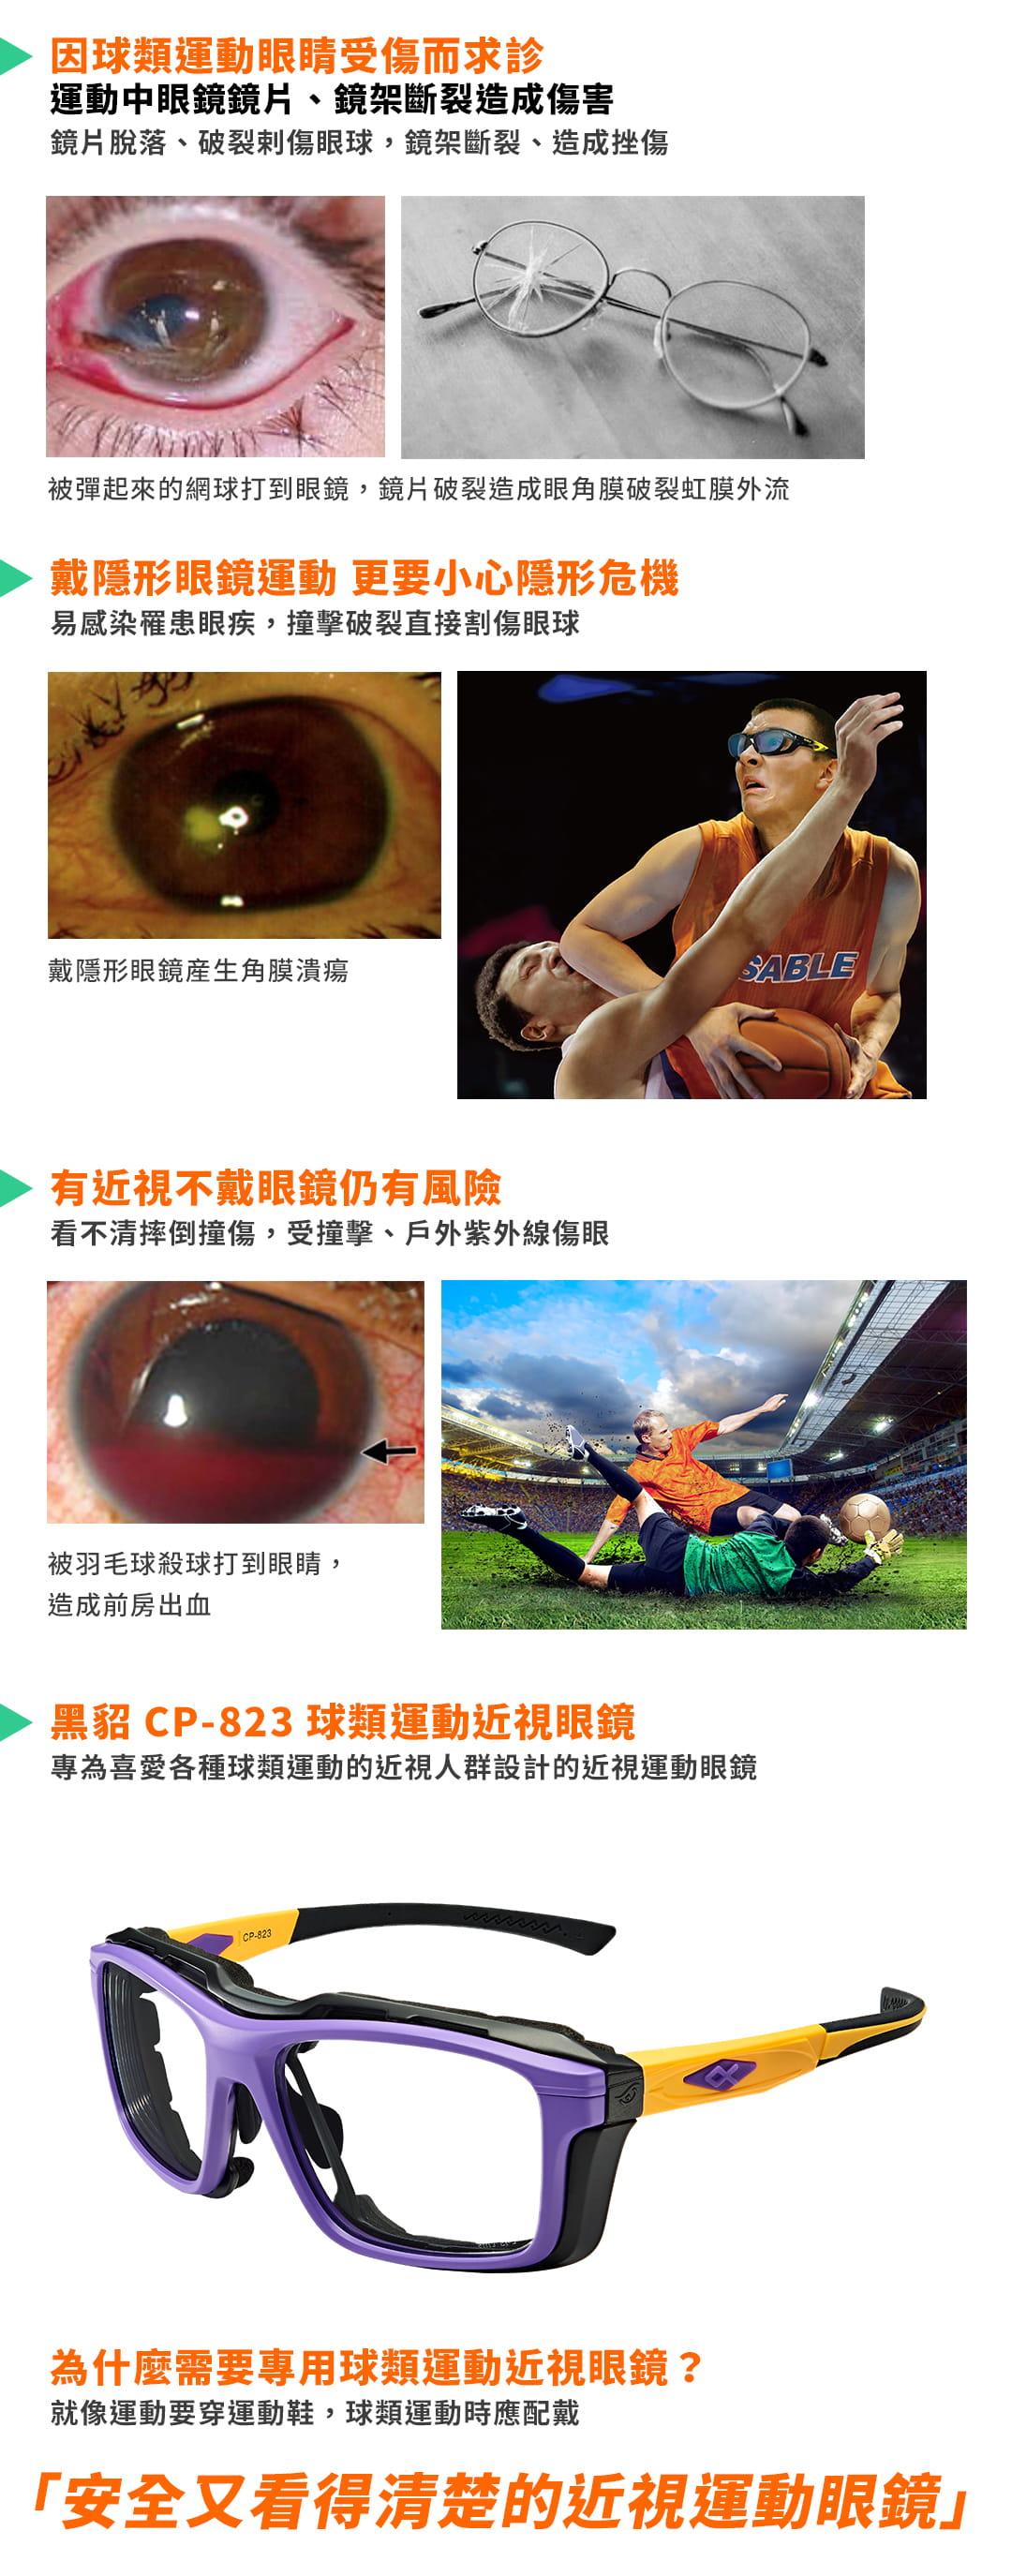 SABLE黑貂光學-專屬球類運動眼鏡CP-823(標準款-無保護墊)+SP-03(平光精緻鍍膜鏡片) 17